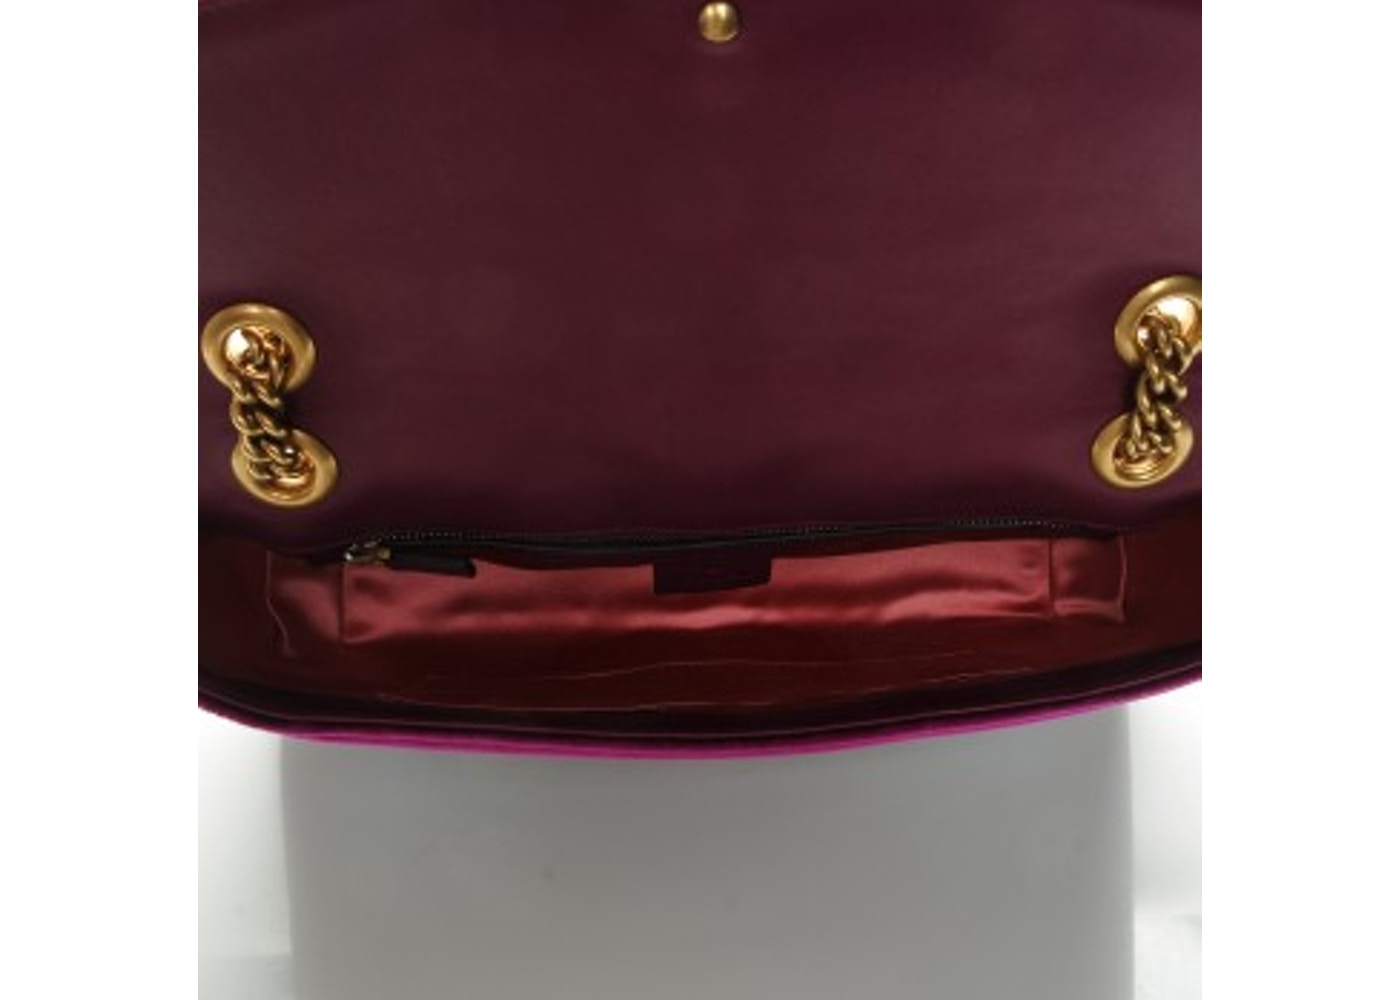 eadd9eb34ea Gucci Marmont Shoulder Bag Embroidered Bordeaux Medium